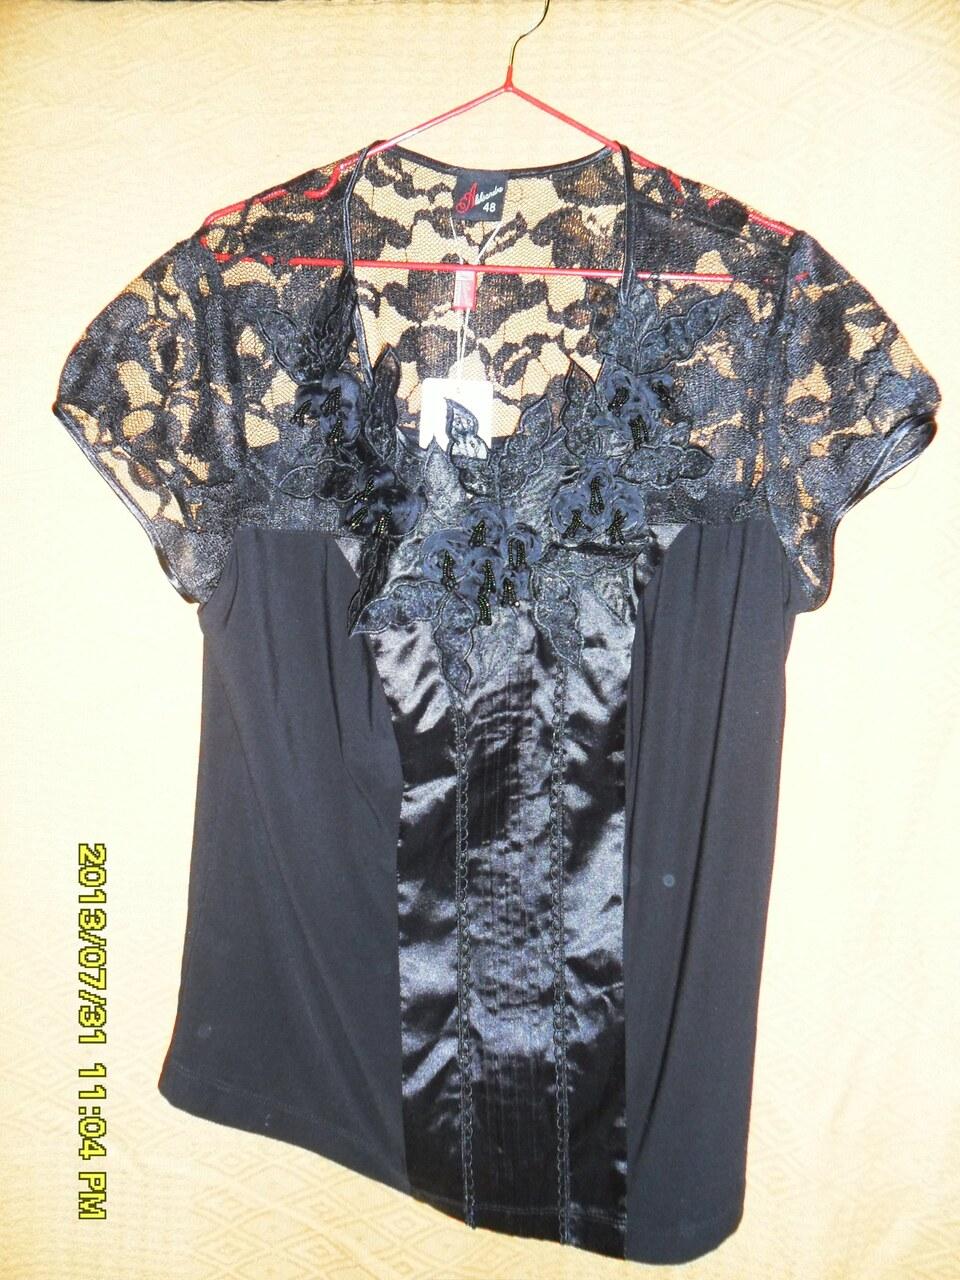 ed1d3a0481b Польские блузки — 2 000 руб. — Общение — Корзина — Price-Altai.ru